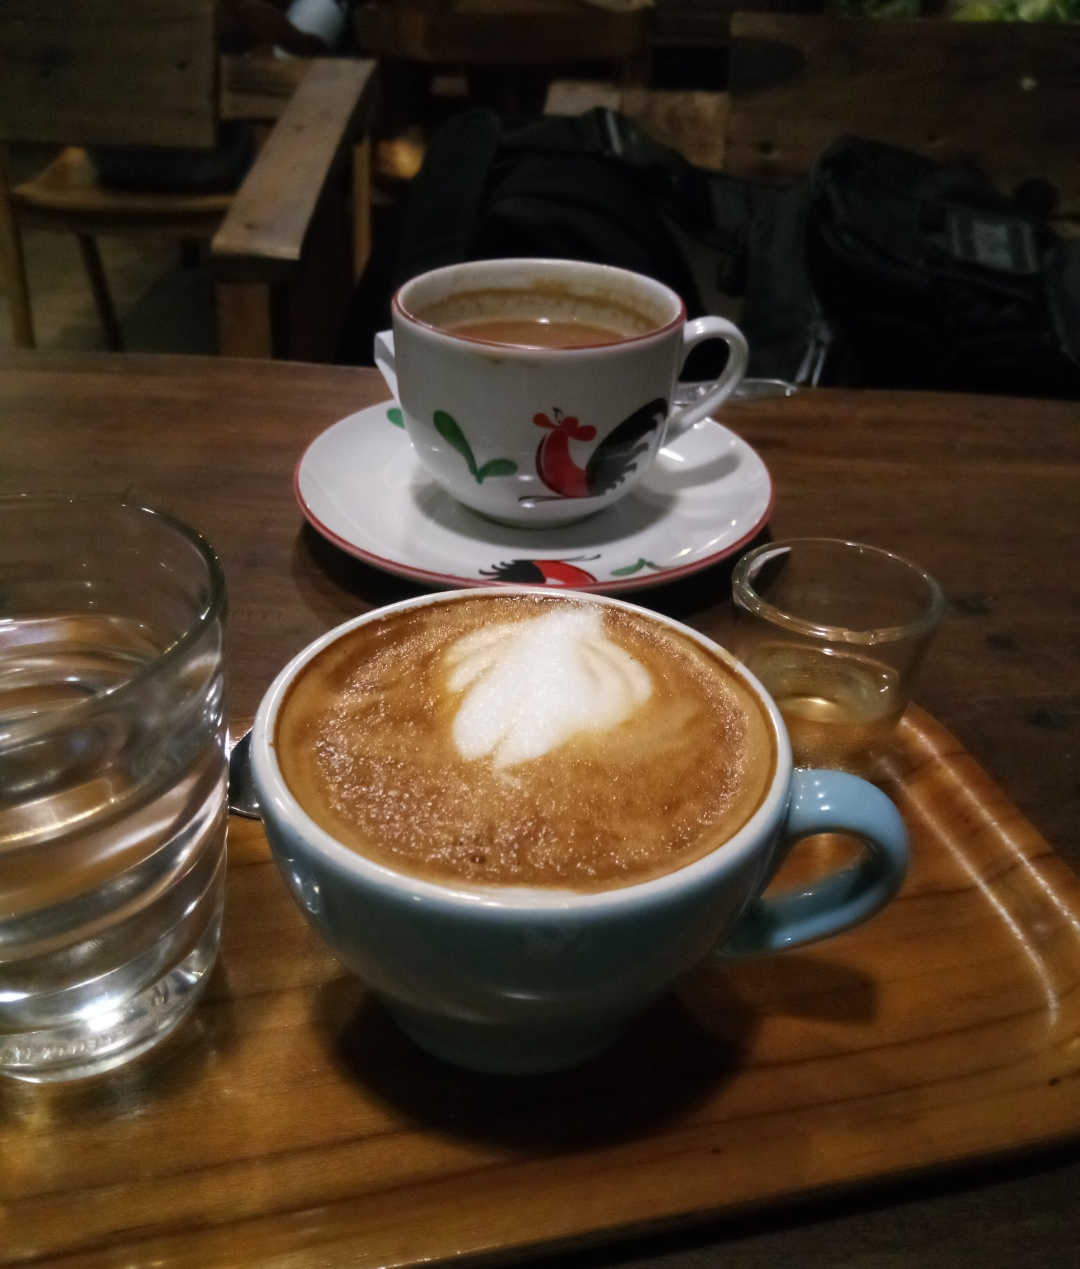 Ini 5 fakta mengenai kopi yang perlu kamu ketahui